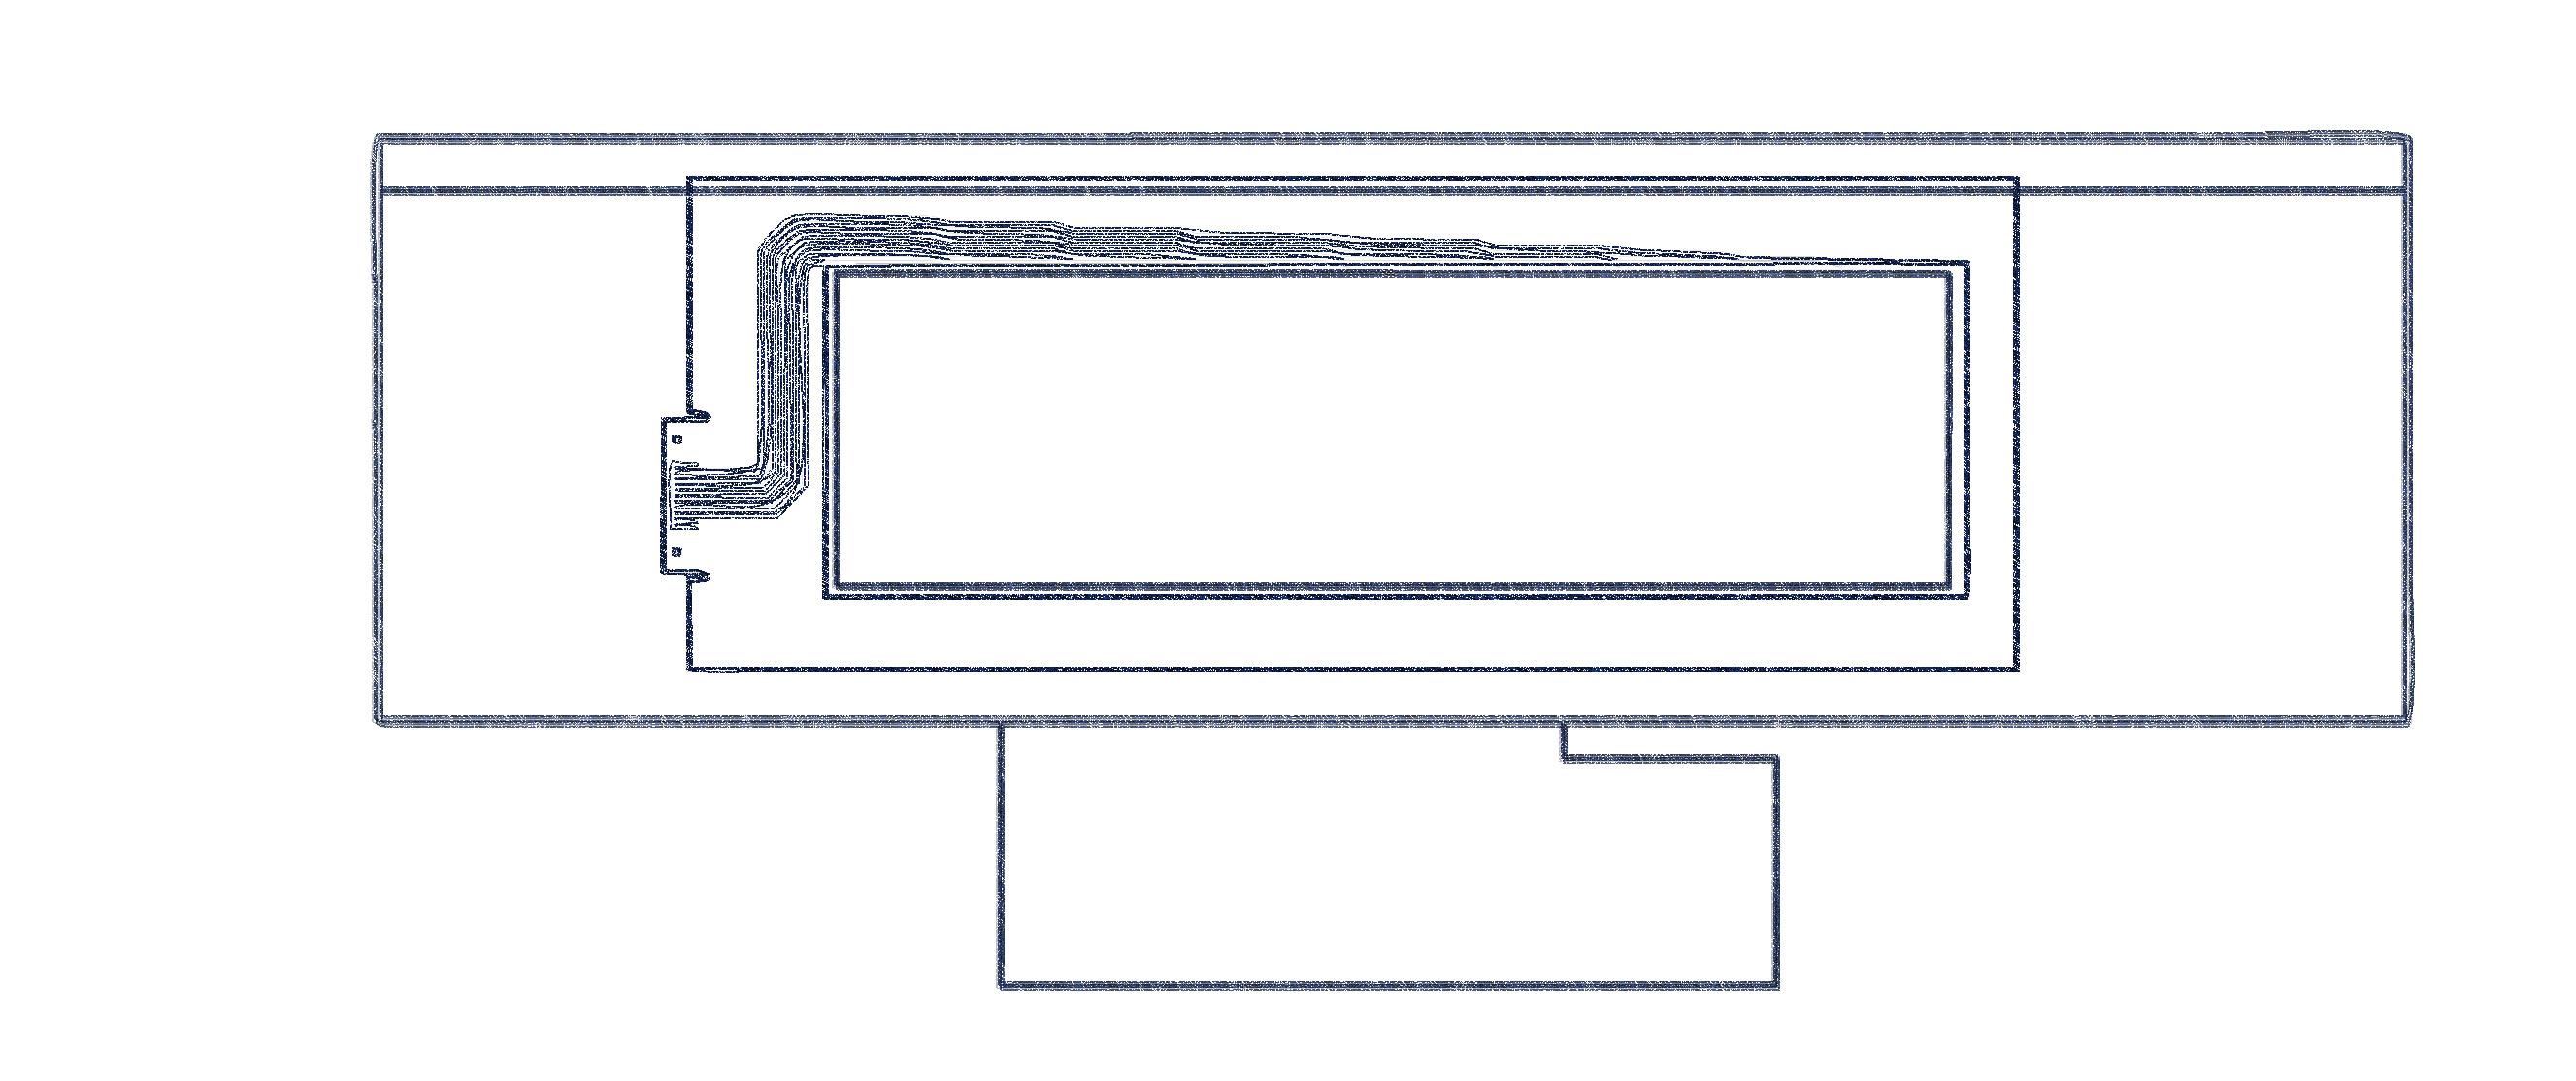 Company C Sketch